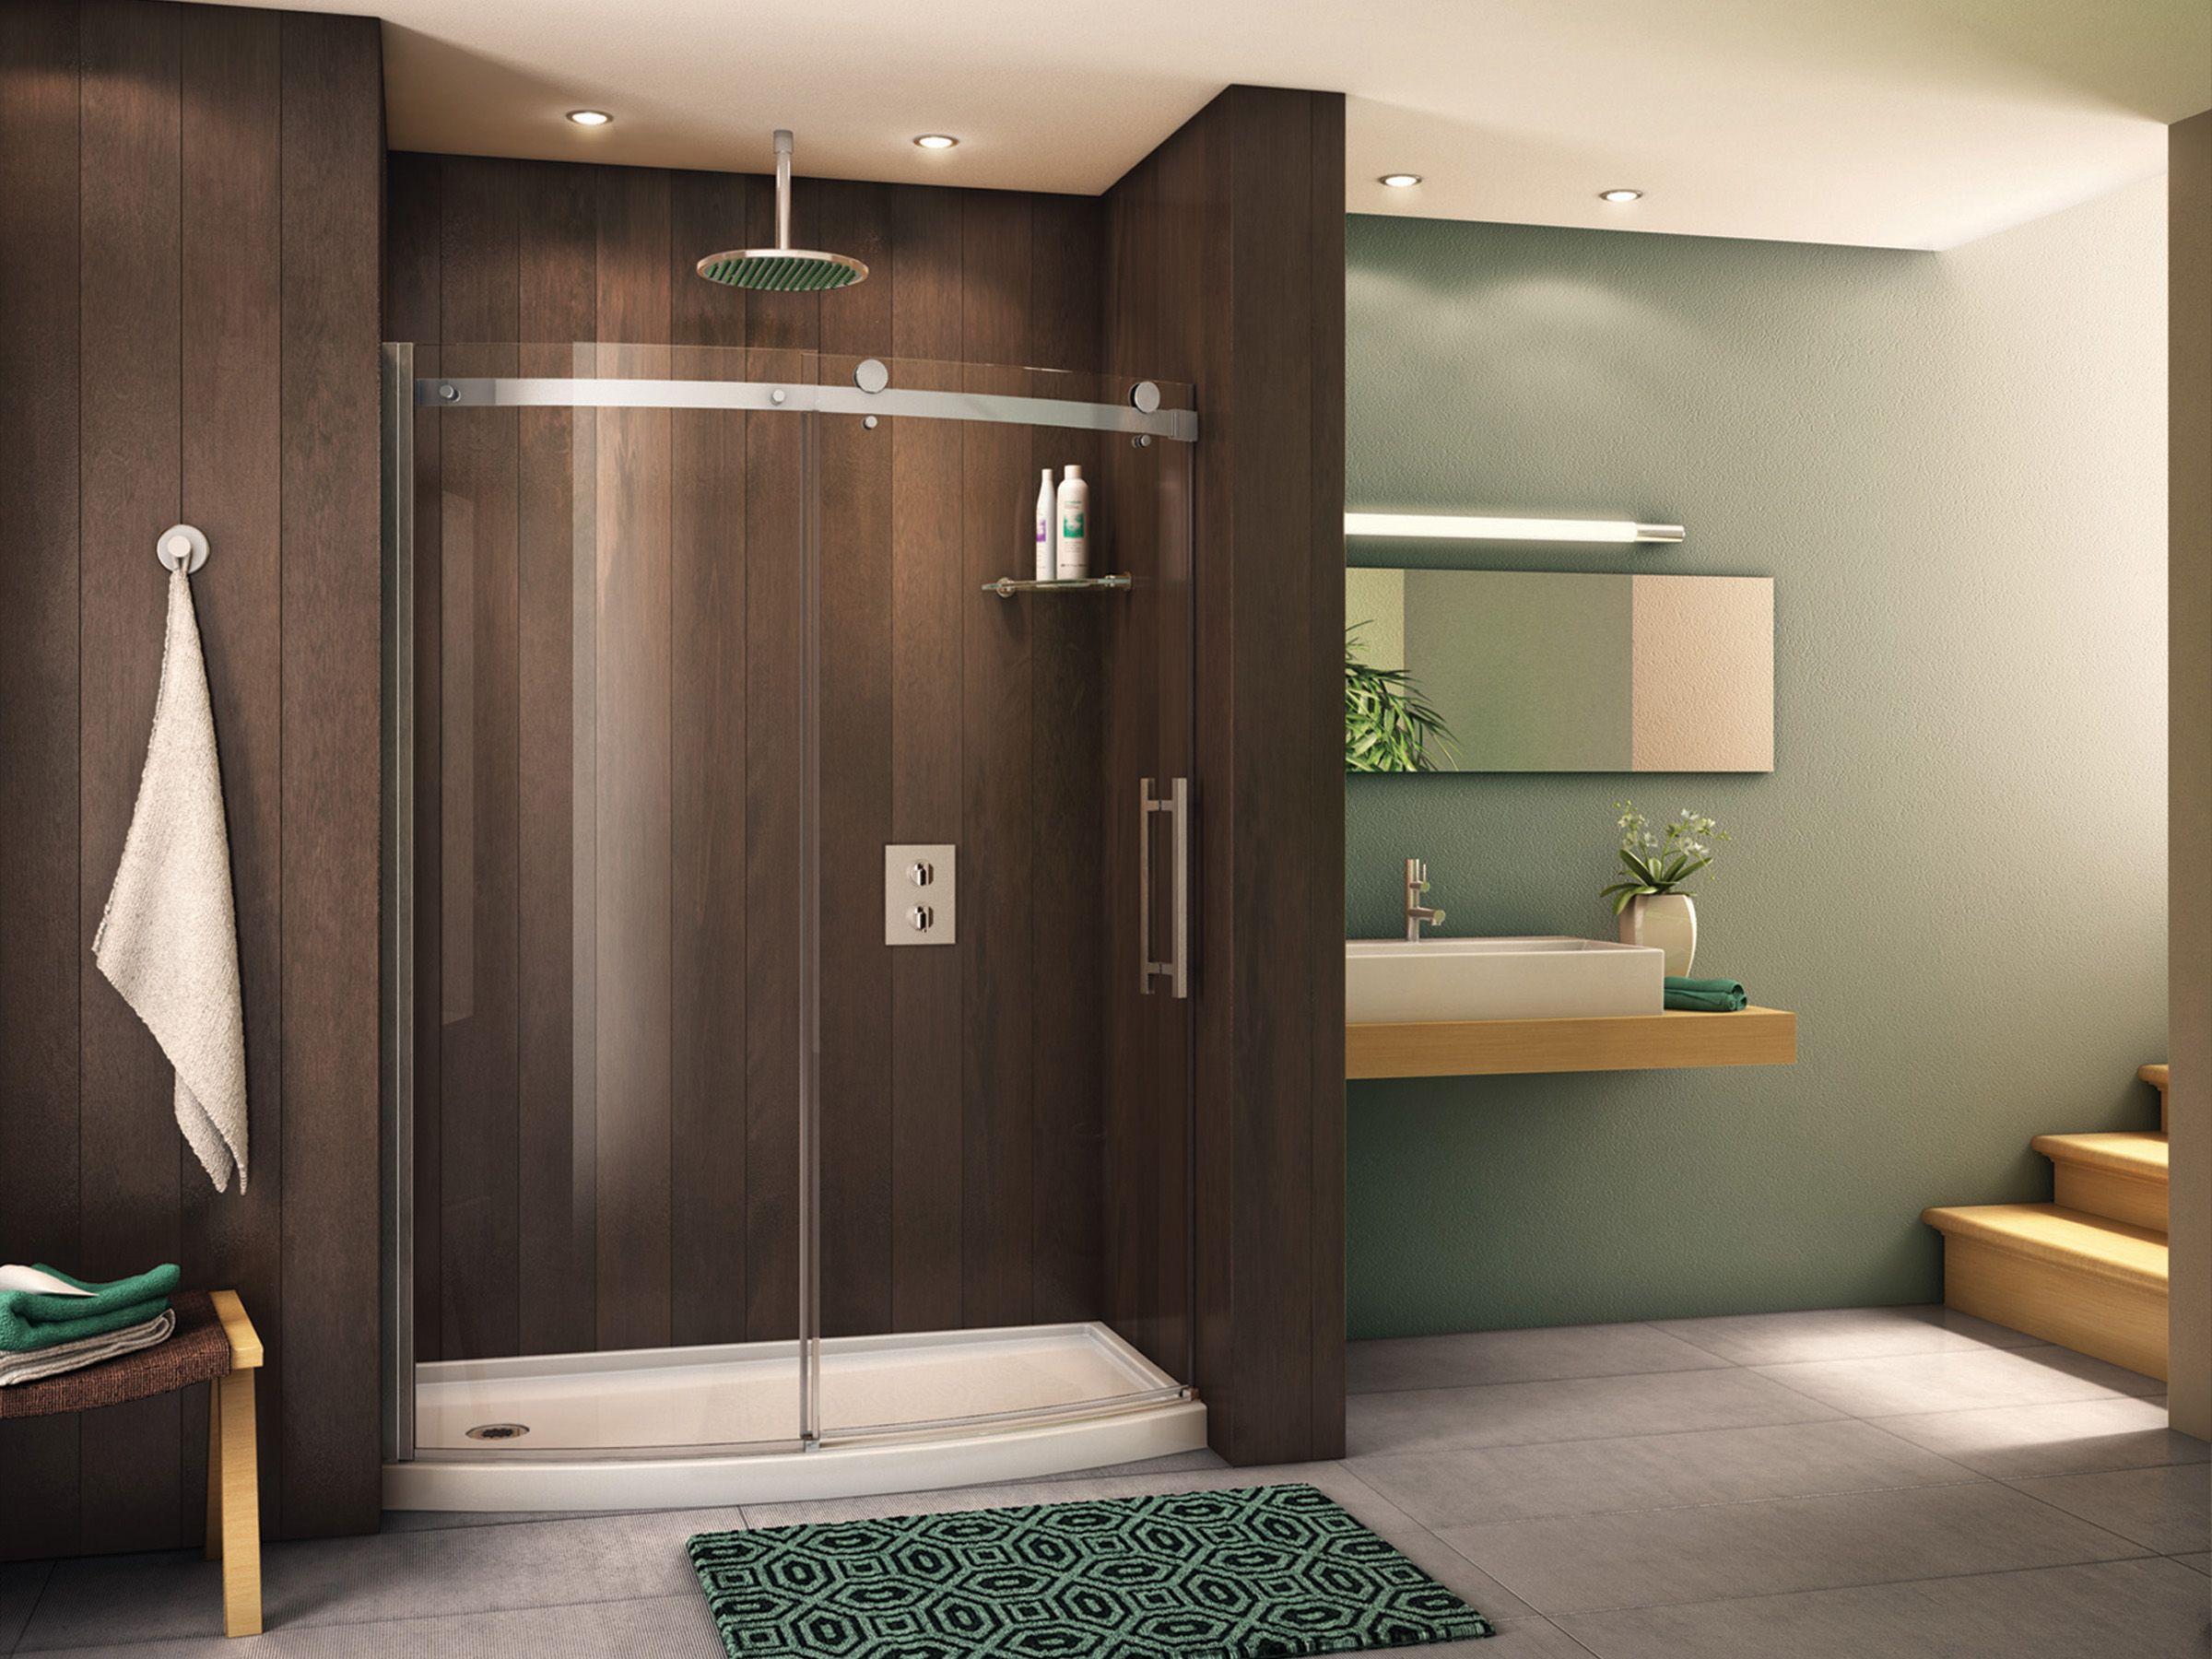 Bathroom Interior. Showy Glass Shower Doors Luxurious Enclosure ...